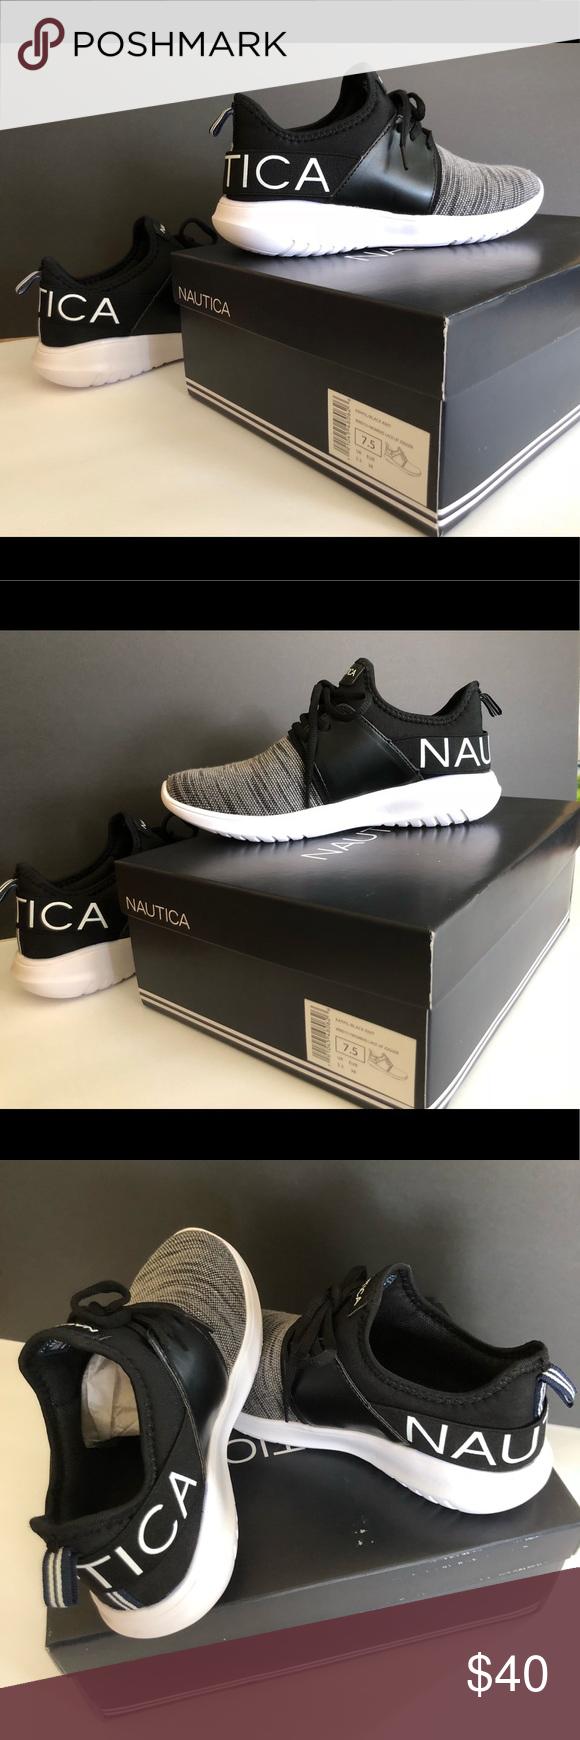 Nautical fashion, Sneaker brands